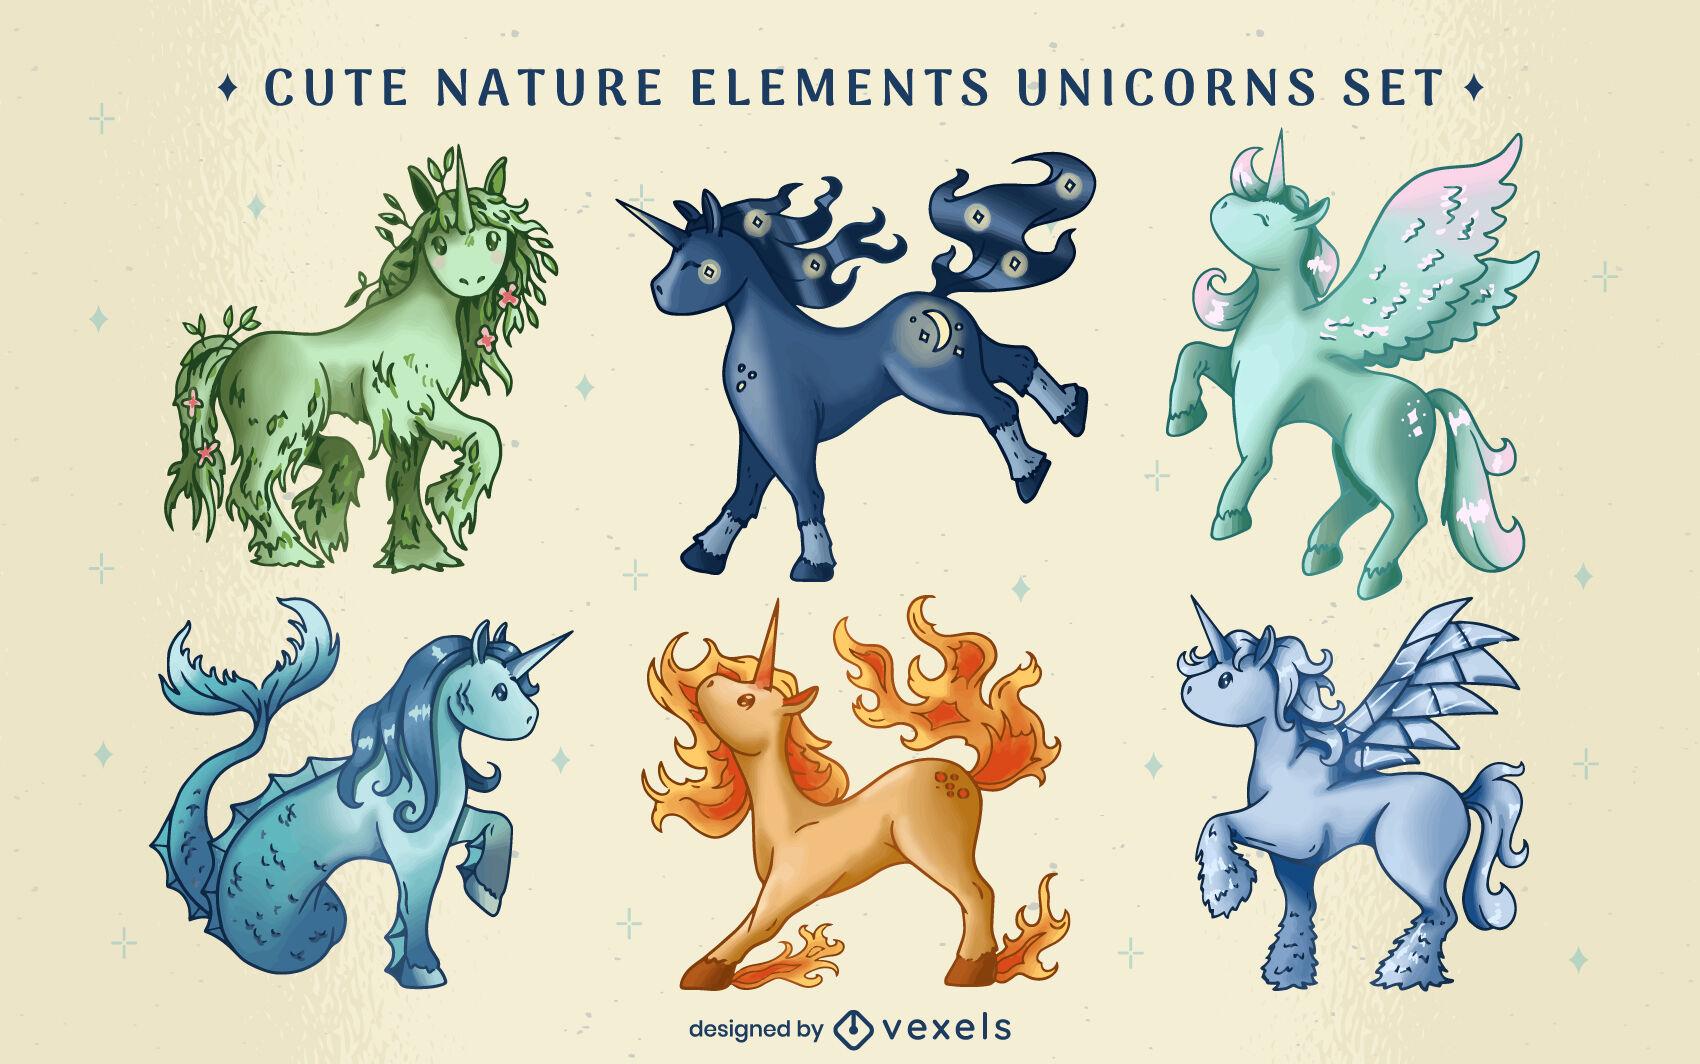 Elemental unicorn creature magical set